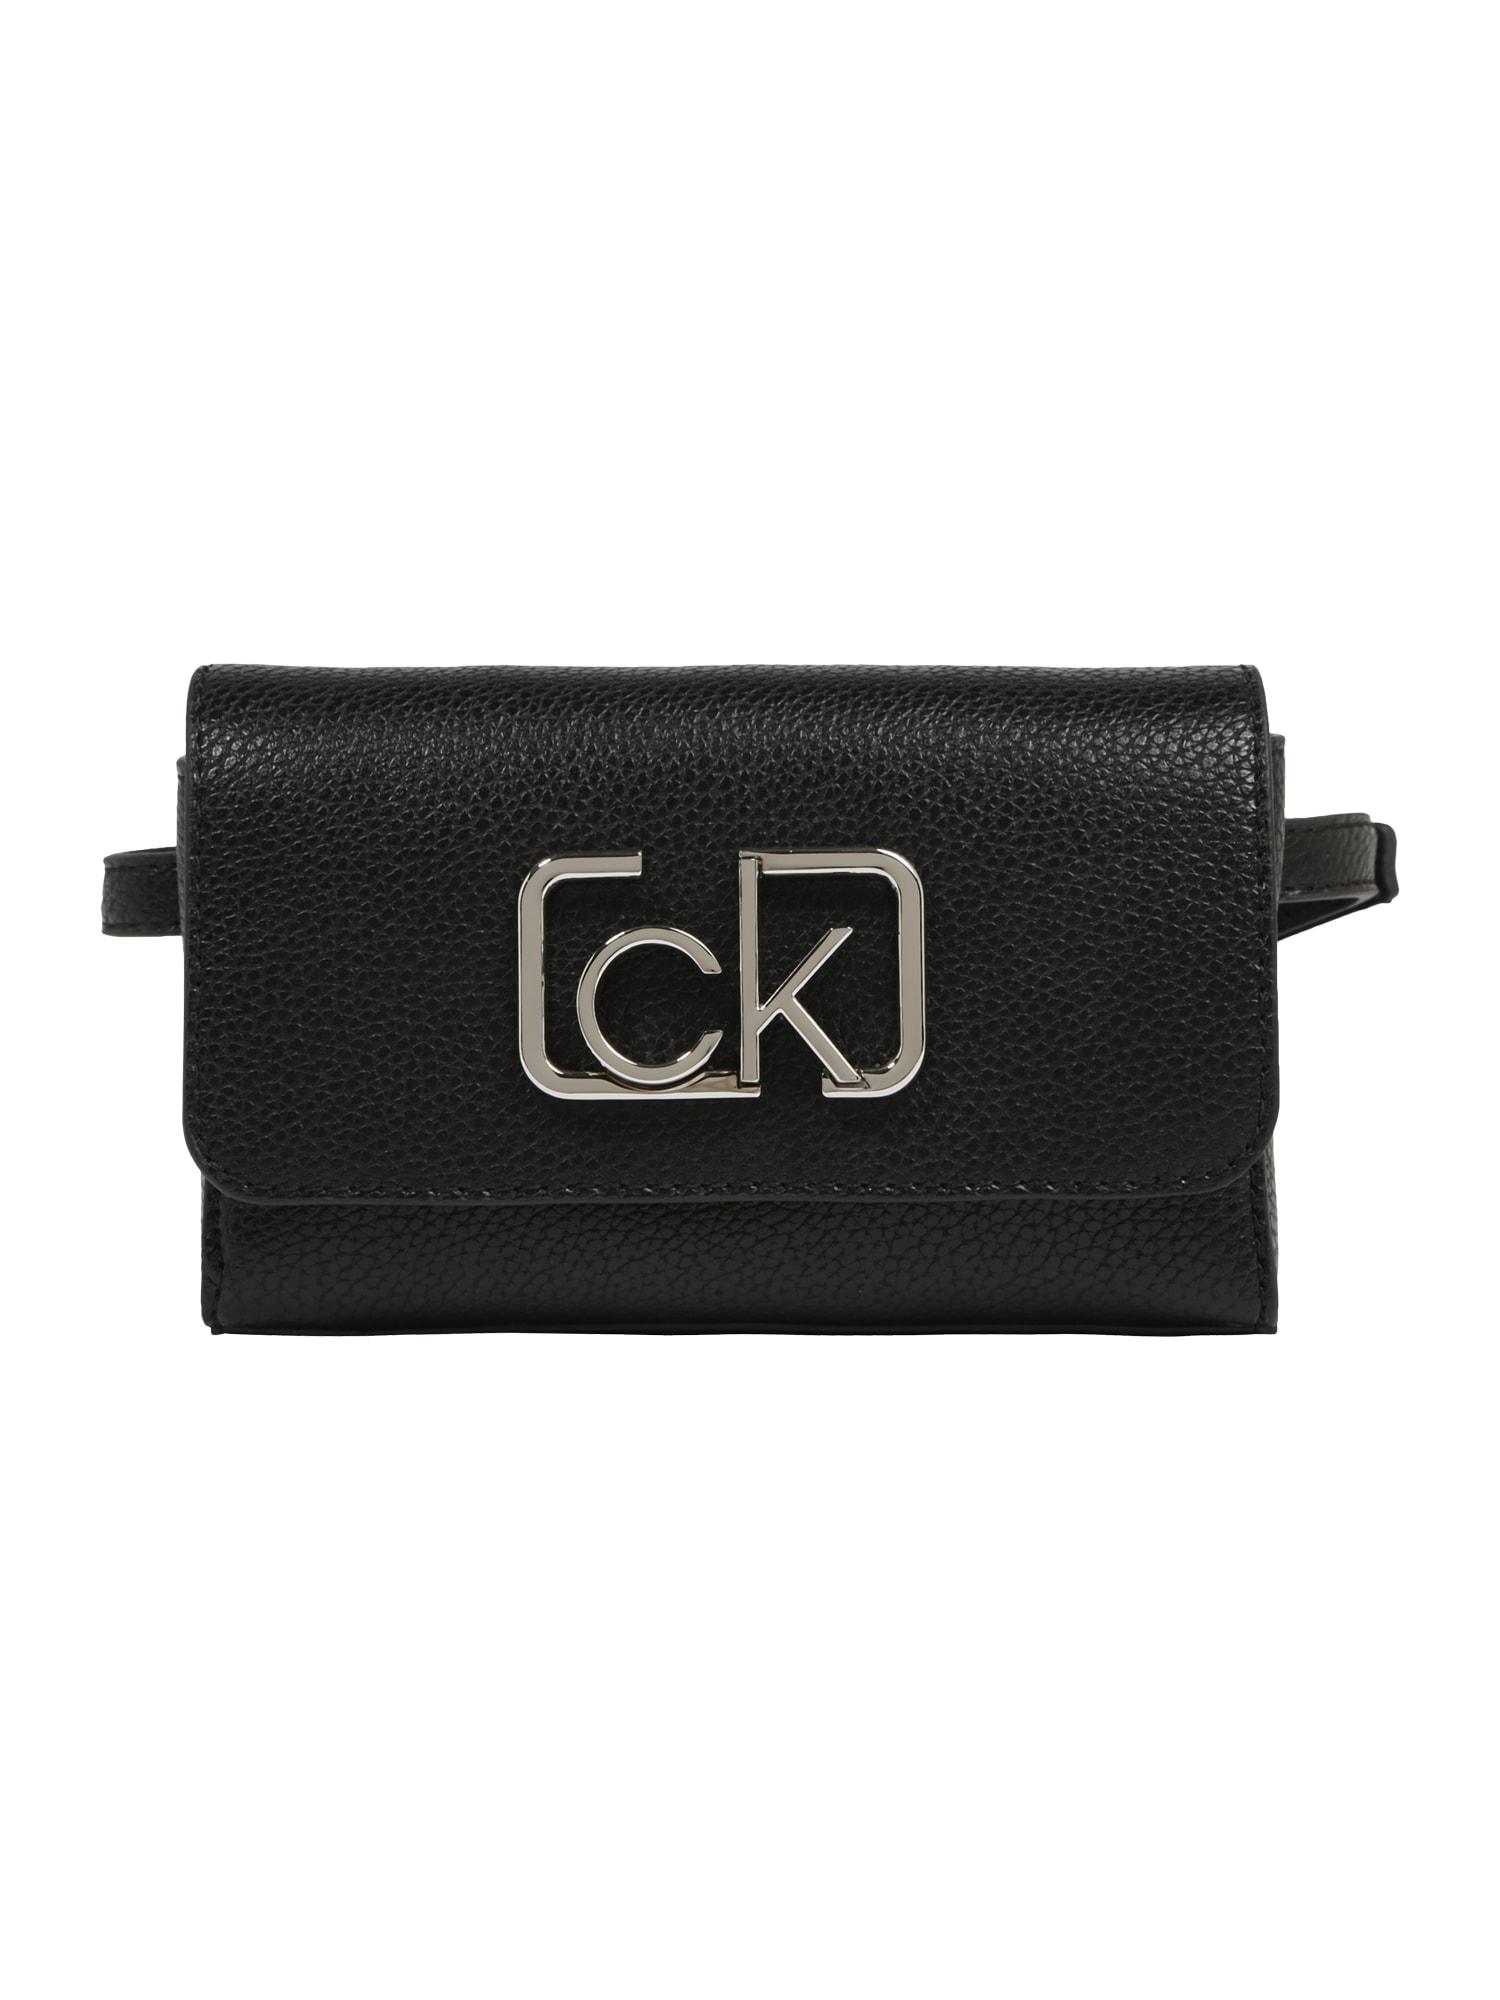 Calvin Klein Rankinė ant juosmens 'CK SIGNATURE BELTBAG' juoda